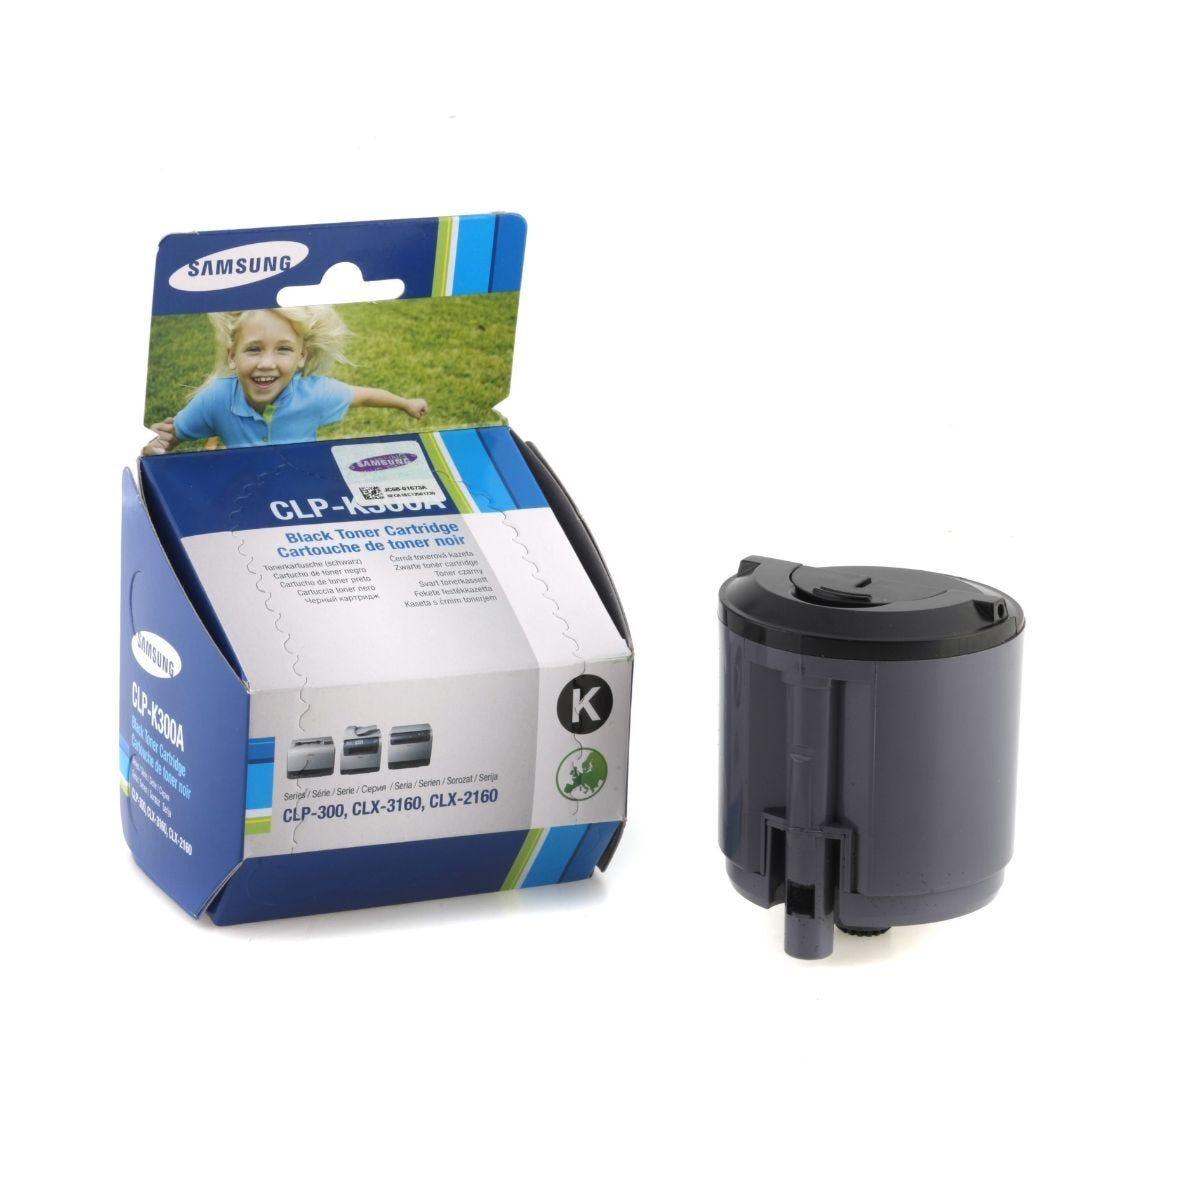 Samsung CLP-K300A Laser Printer Ink Toner Cartridge